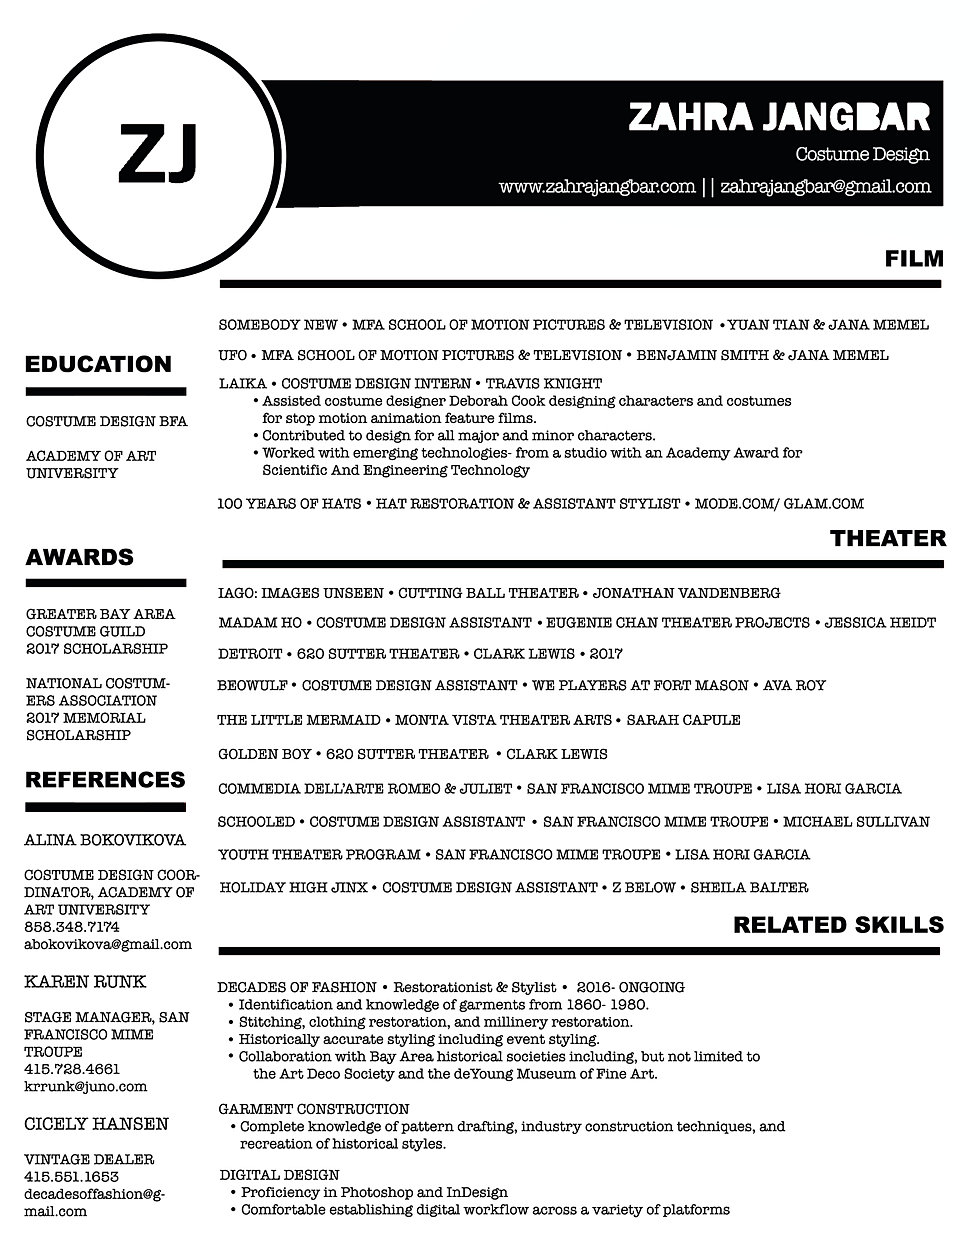 Resume | Zahra Jangbar